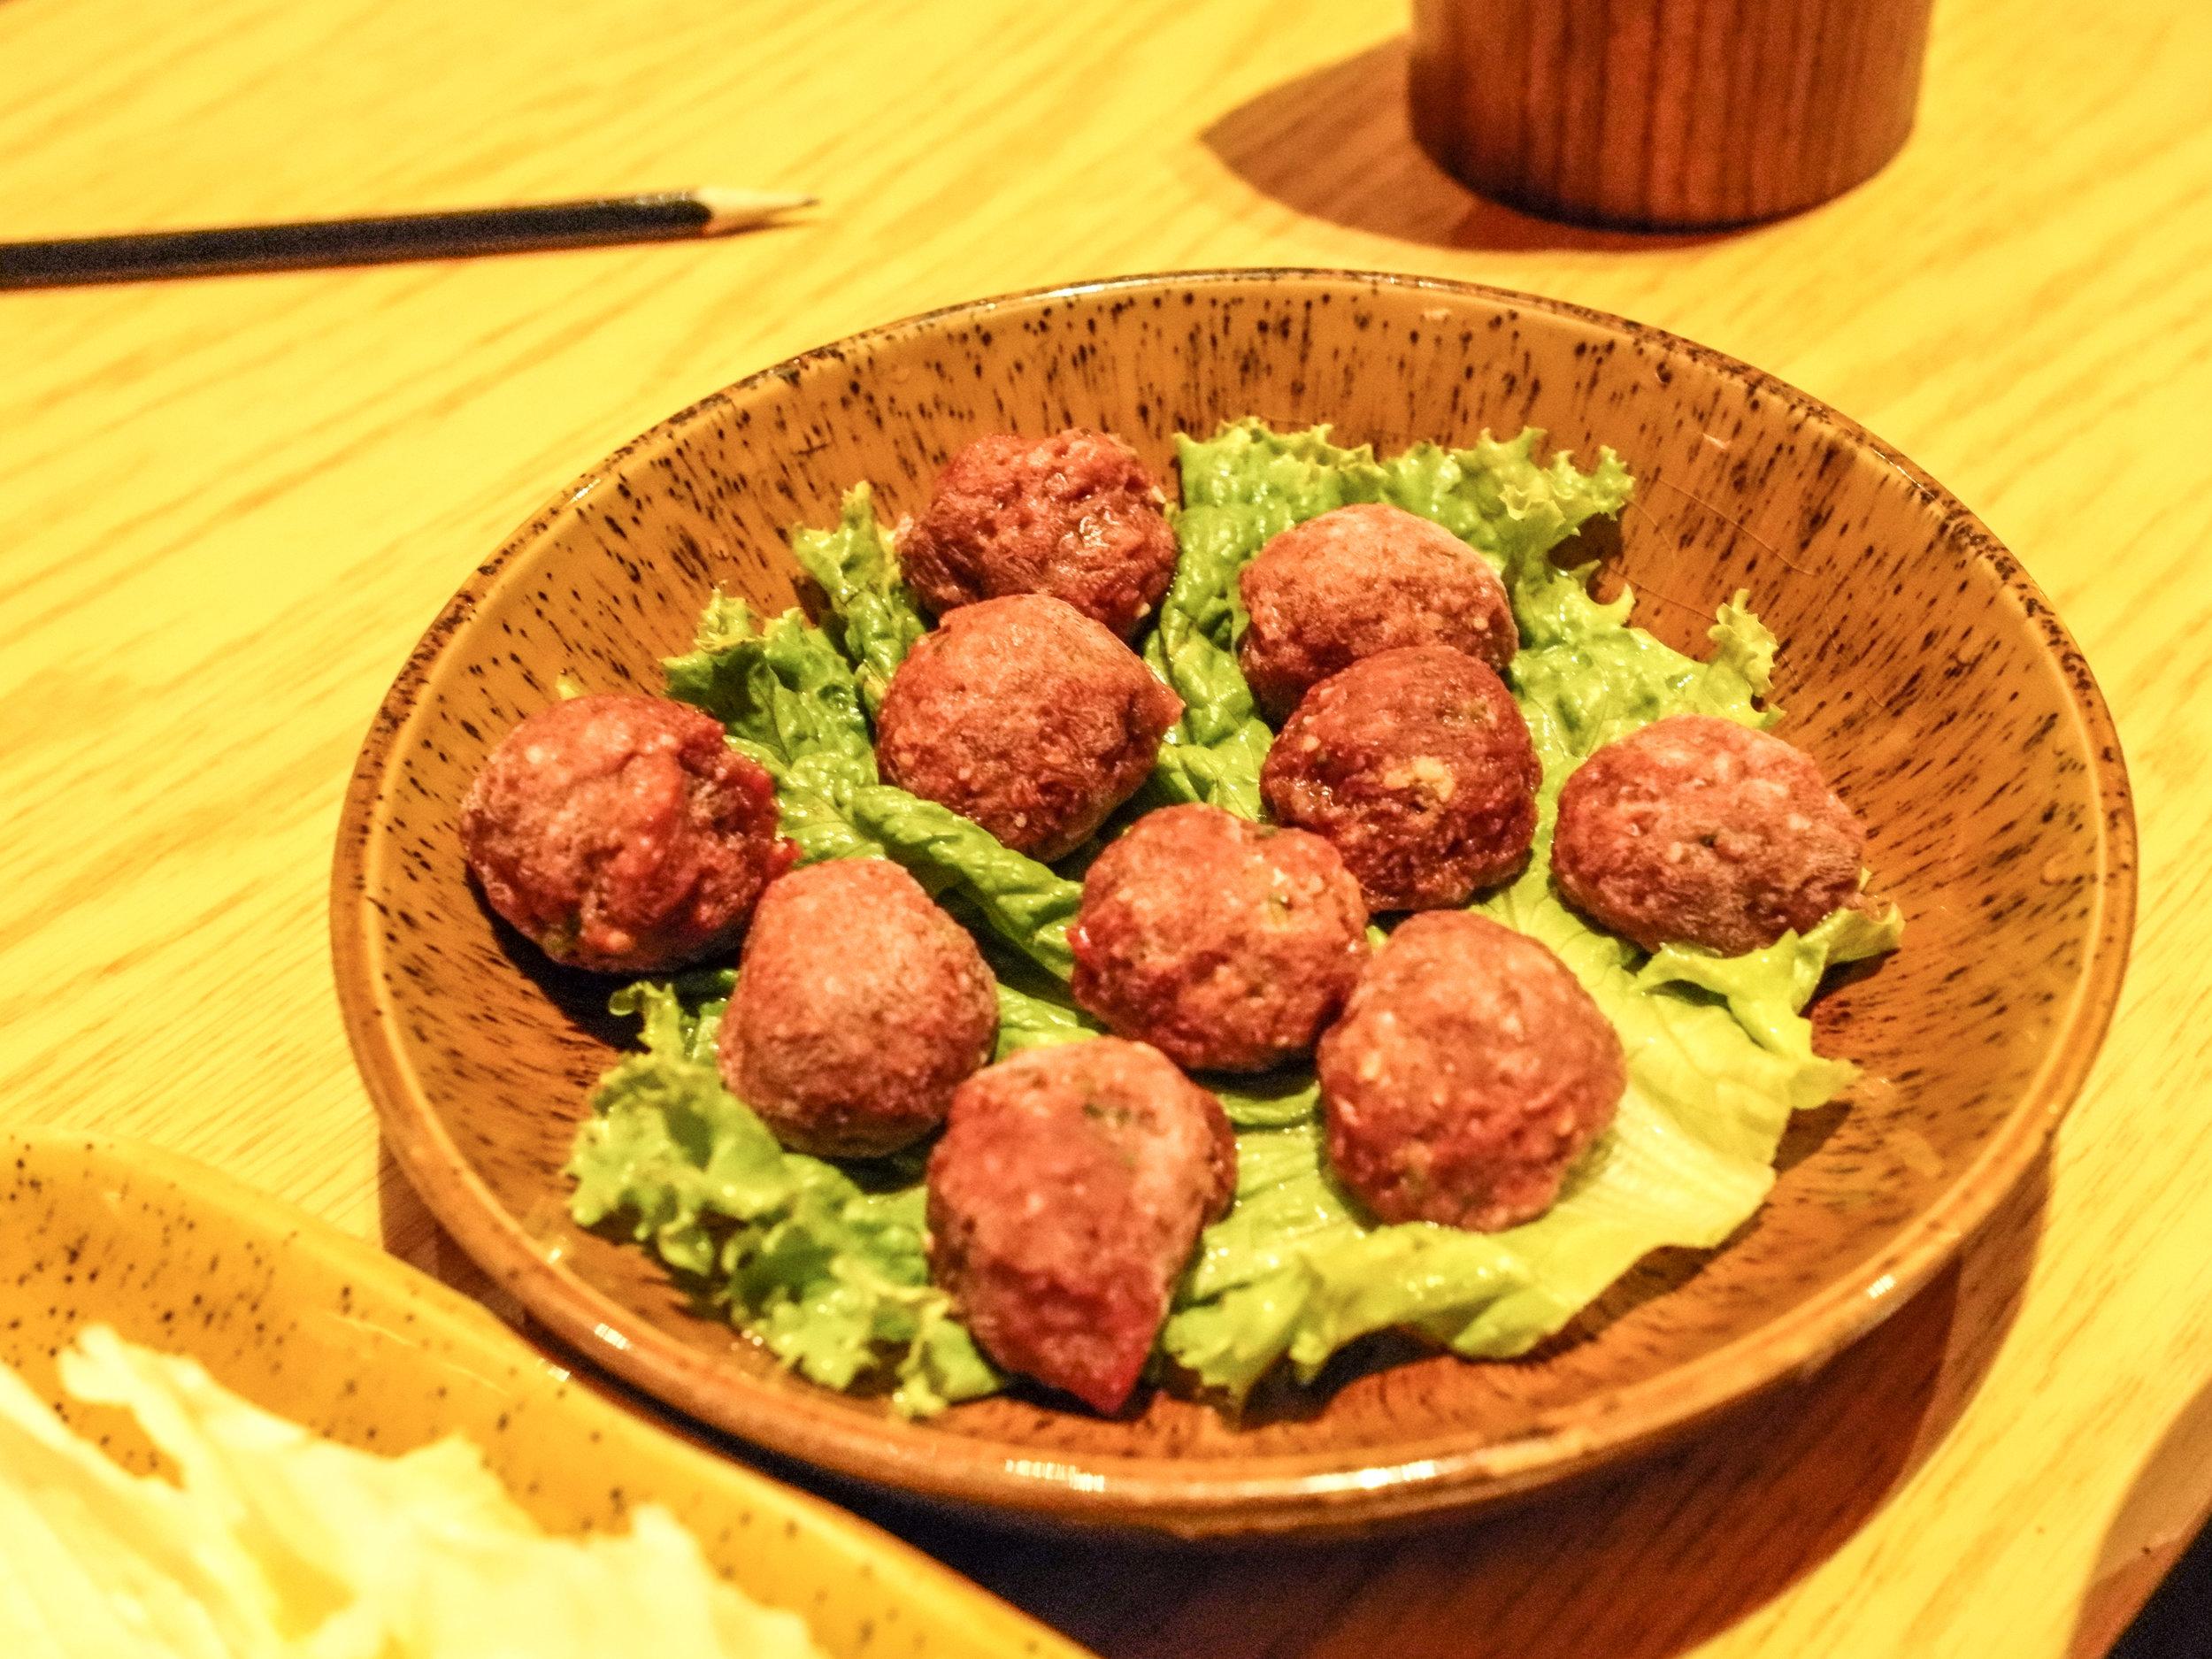 Hot Spot - meatballs